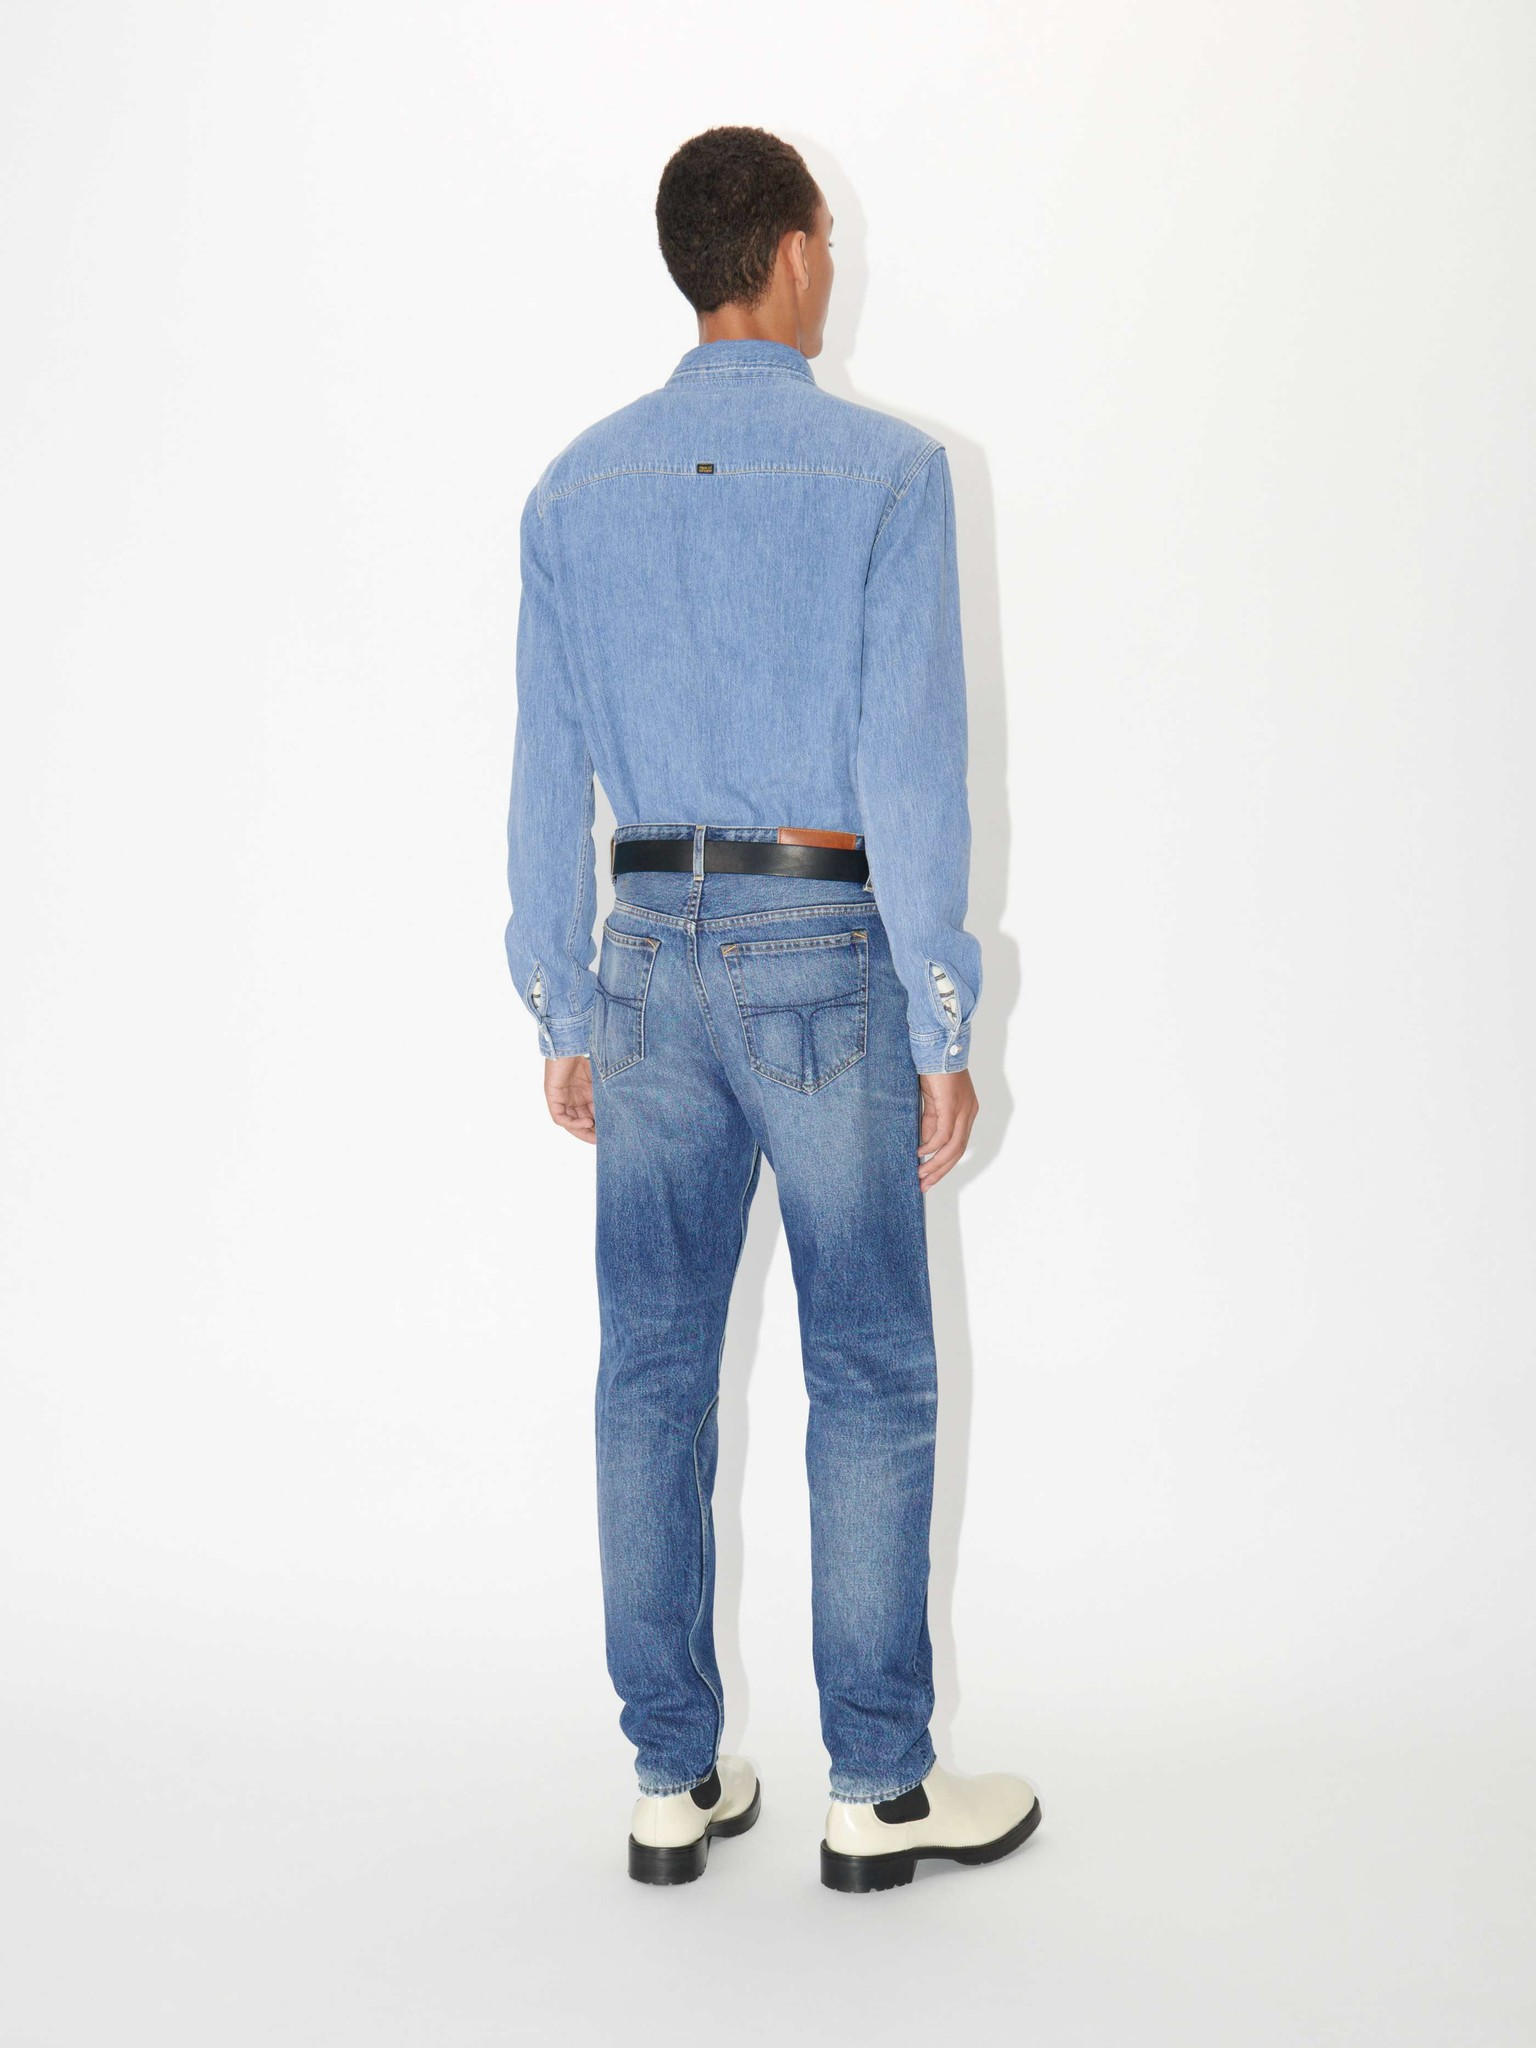 Pure NP. Lichtblauw Jeans Shirt-3